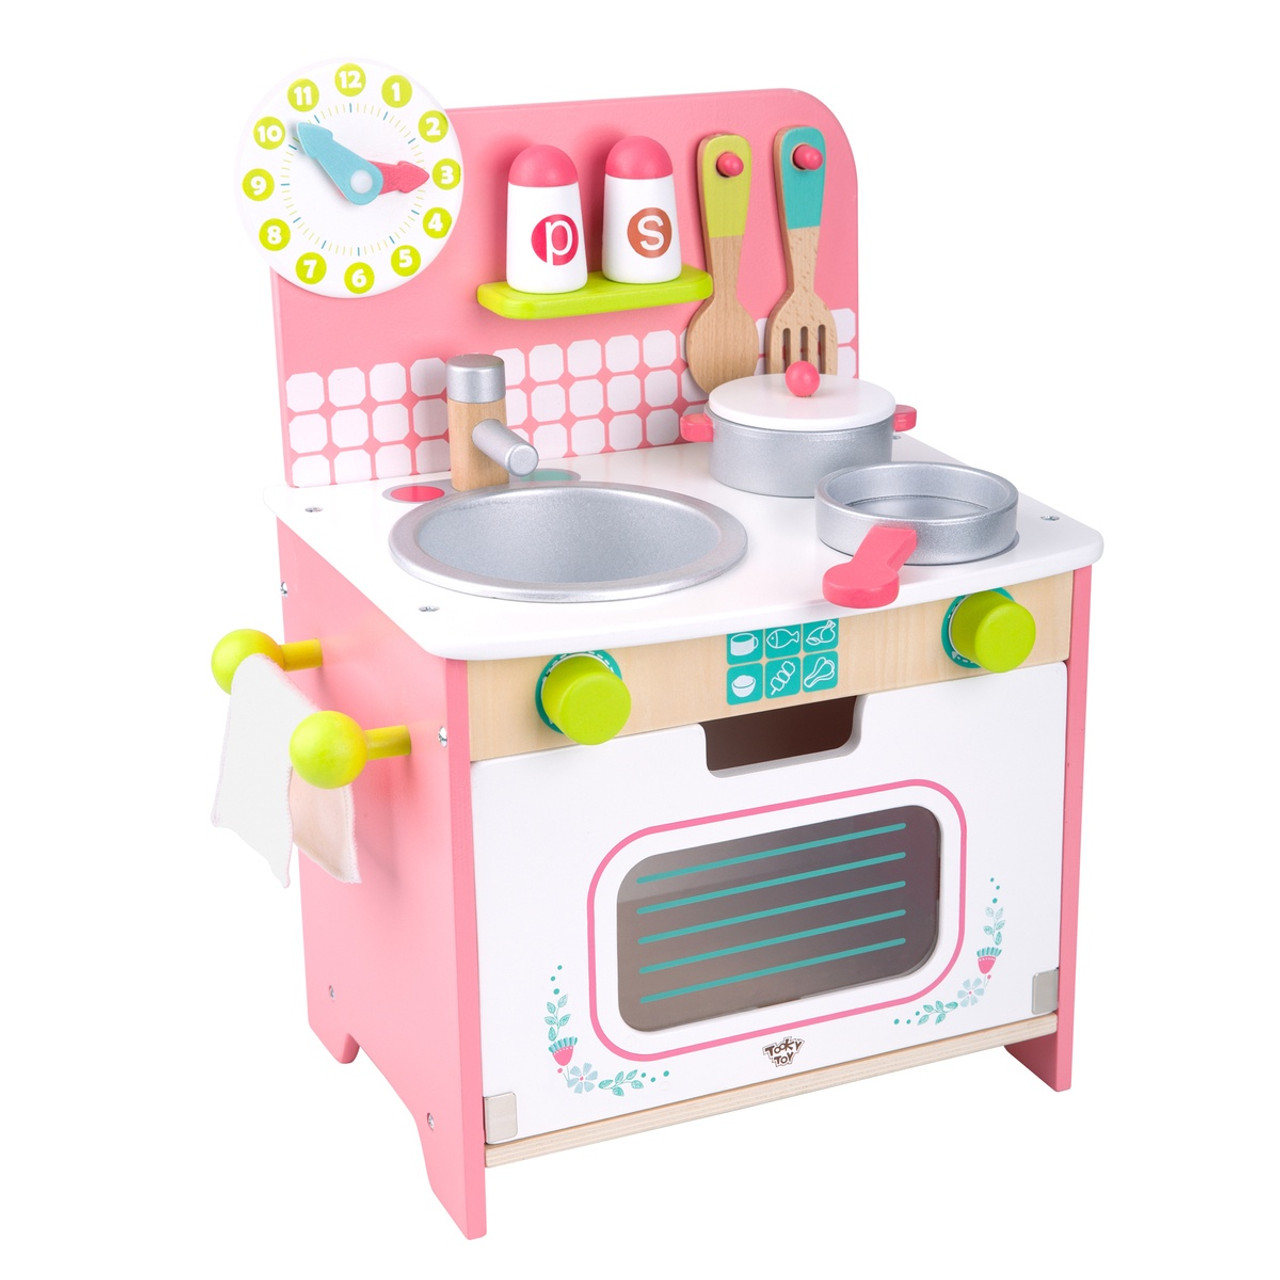 Tooky Toy Wooden Kitchen Set - Medium